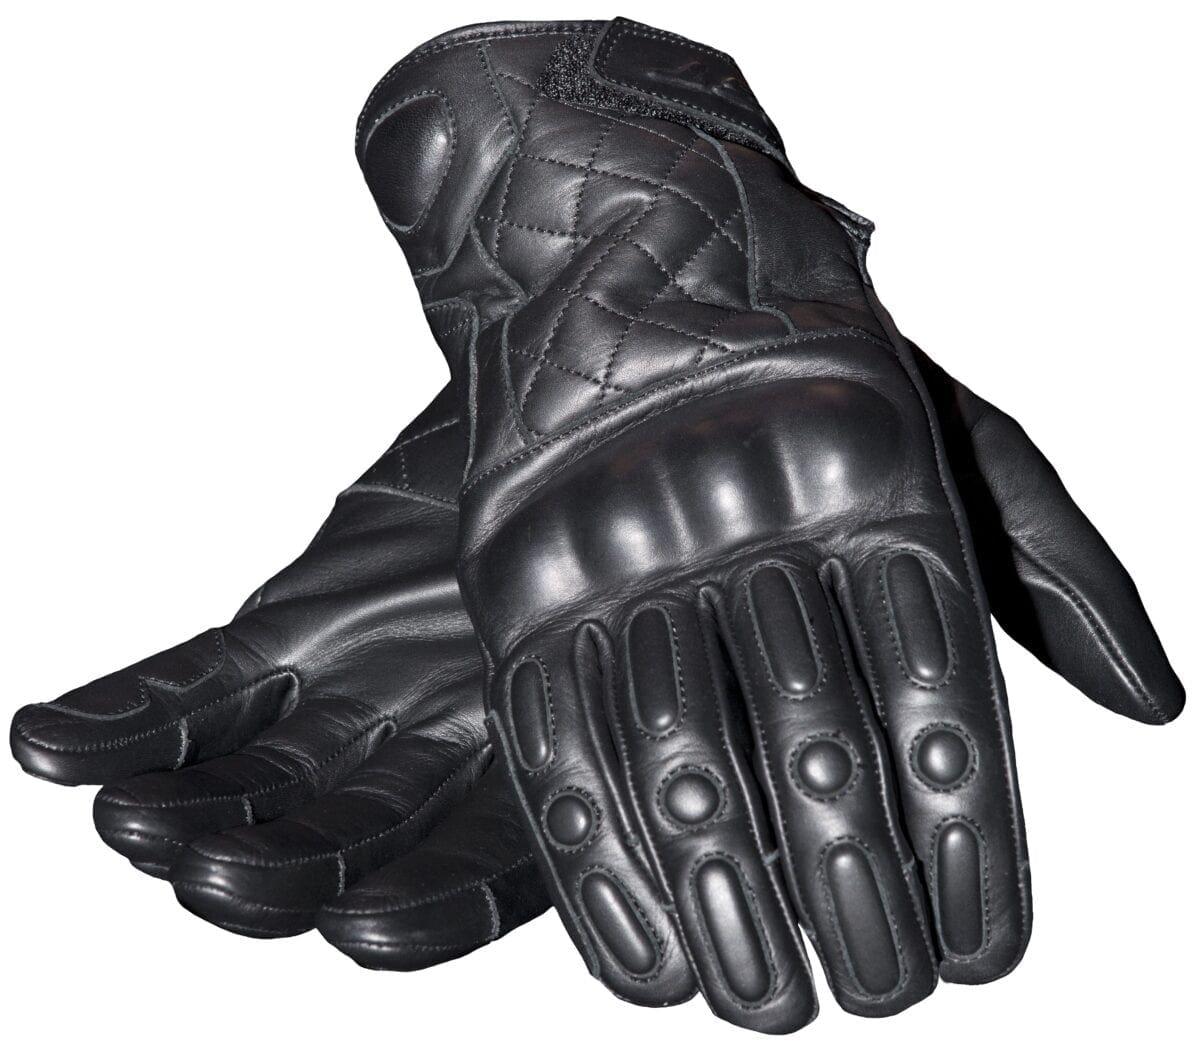 060_Kit_RST retro leather glove